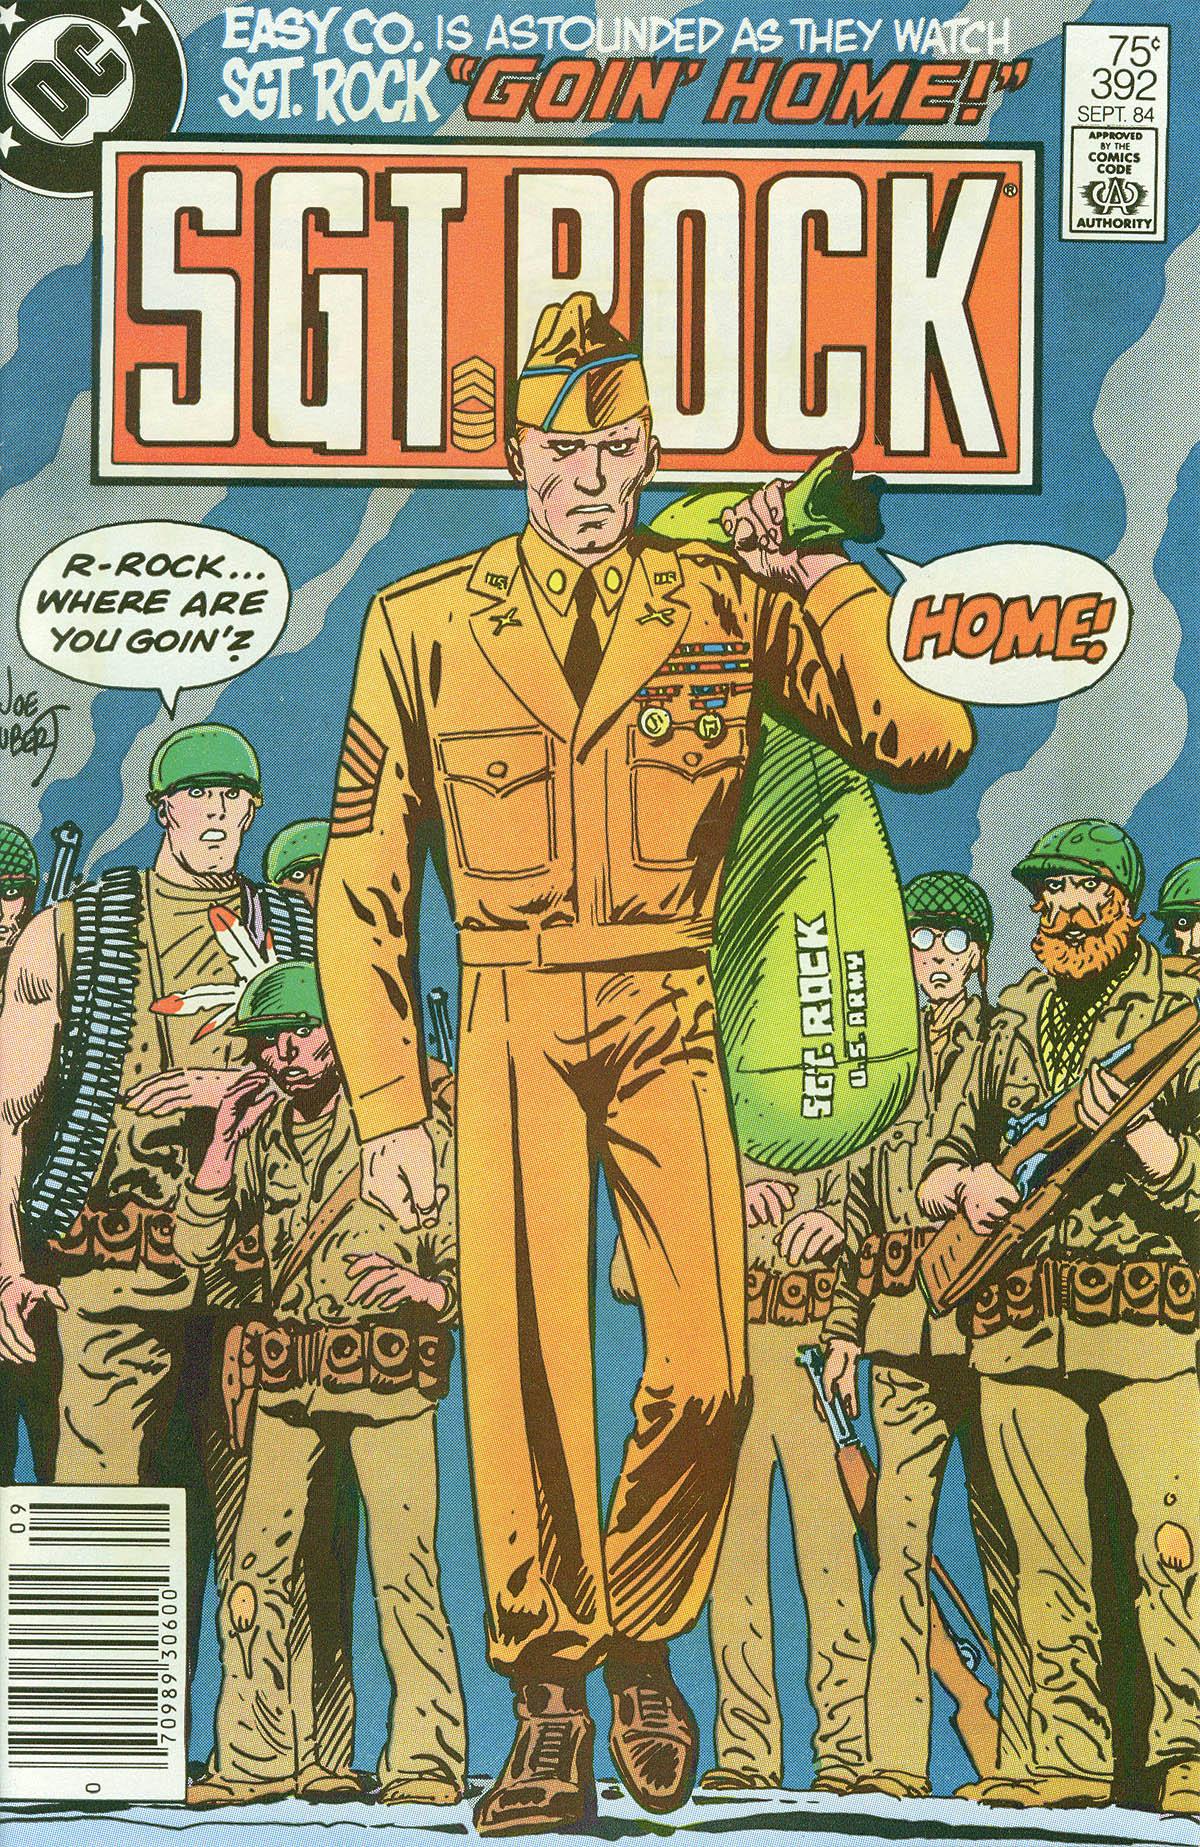 Read online Sgt. Rock comic -  Issue #392 - 1